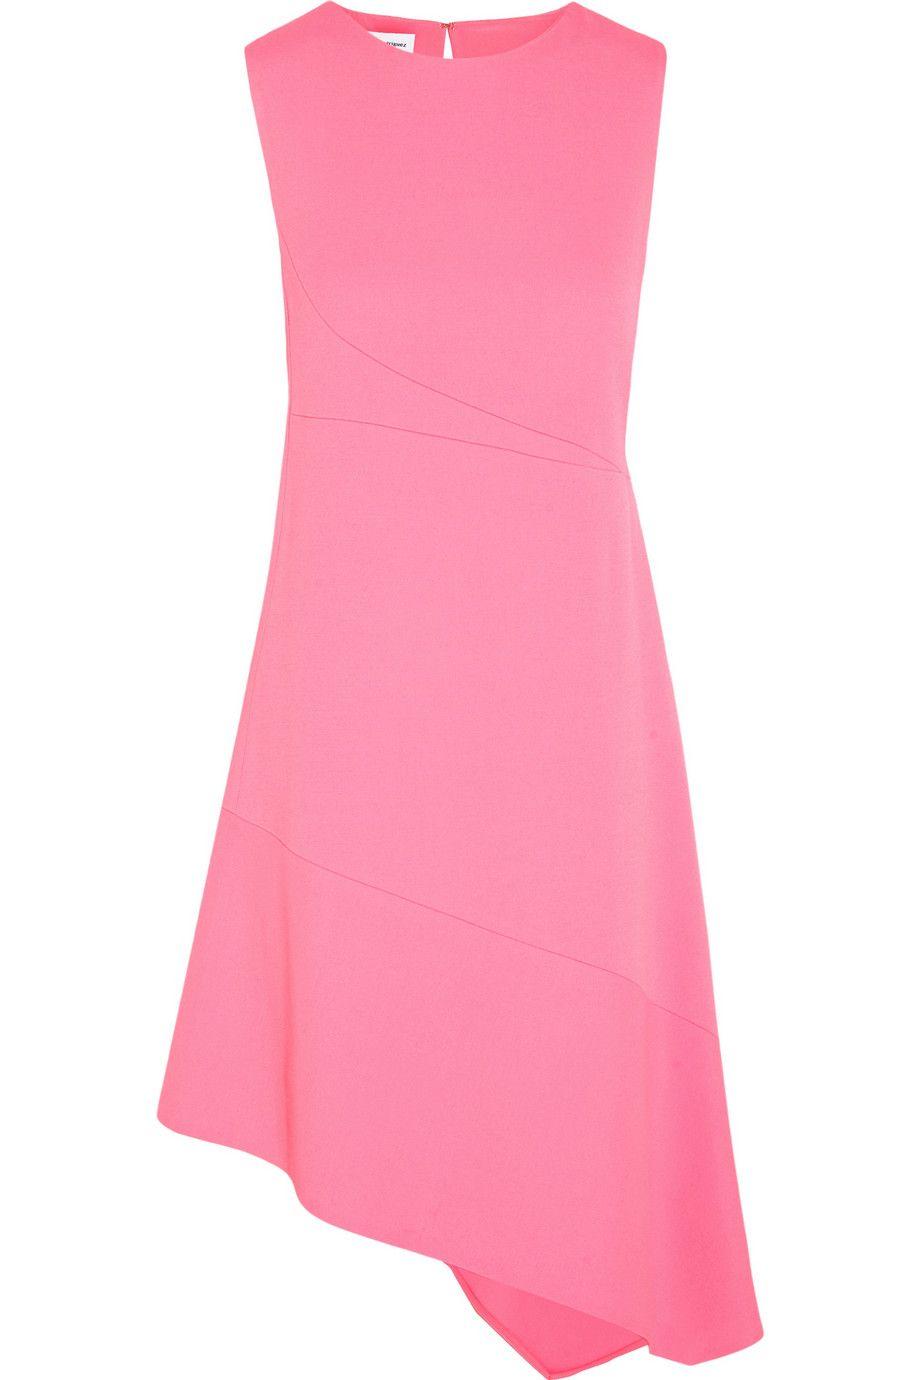 NARCISO RODRIGUEZ Asymmetric Crepe Dress. #narcisorodriguez #cloth ...